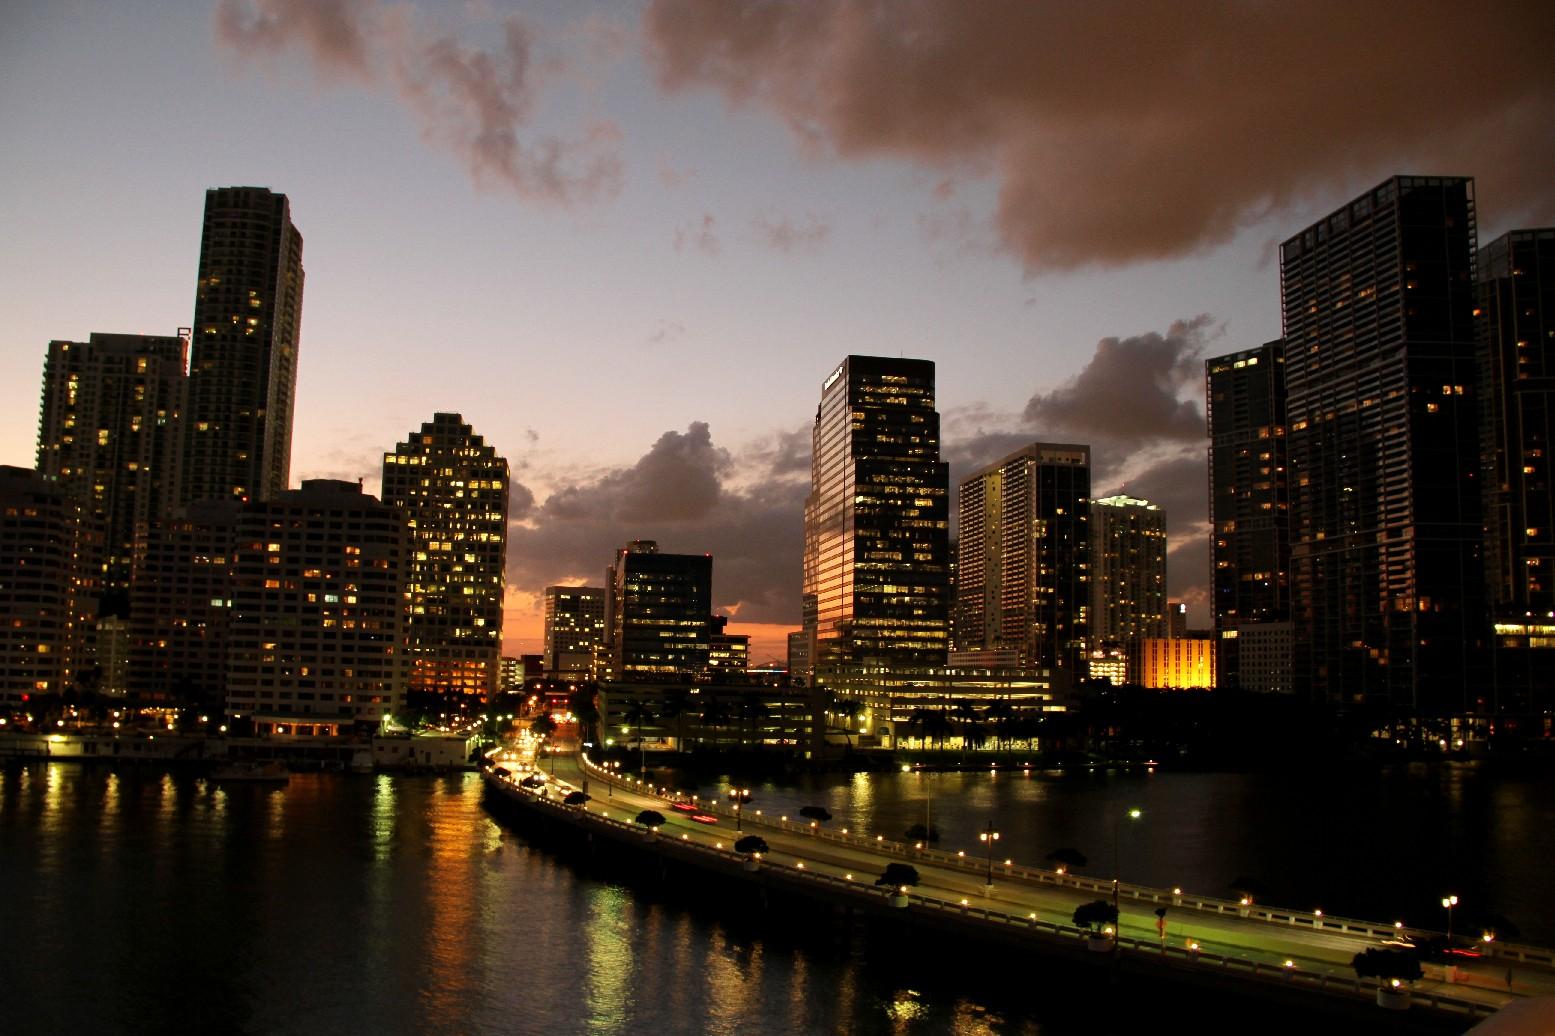 Região de Brickell, em Miami (foto: Eduardo Vessoni)